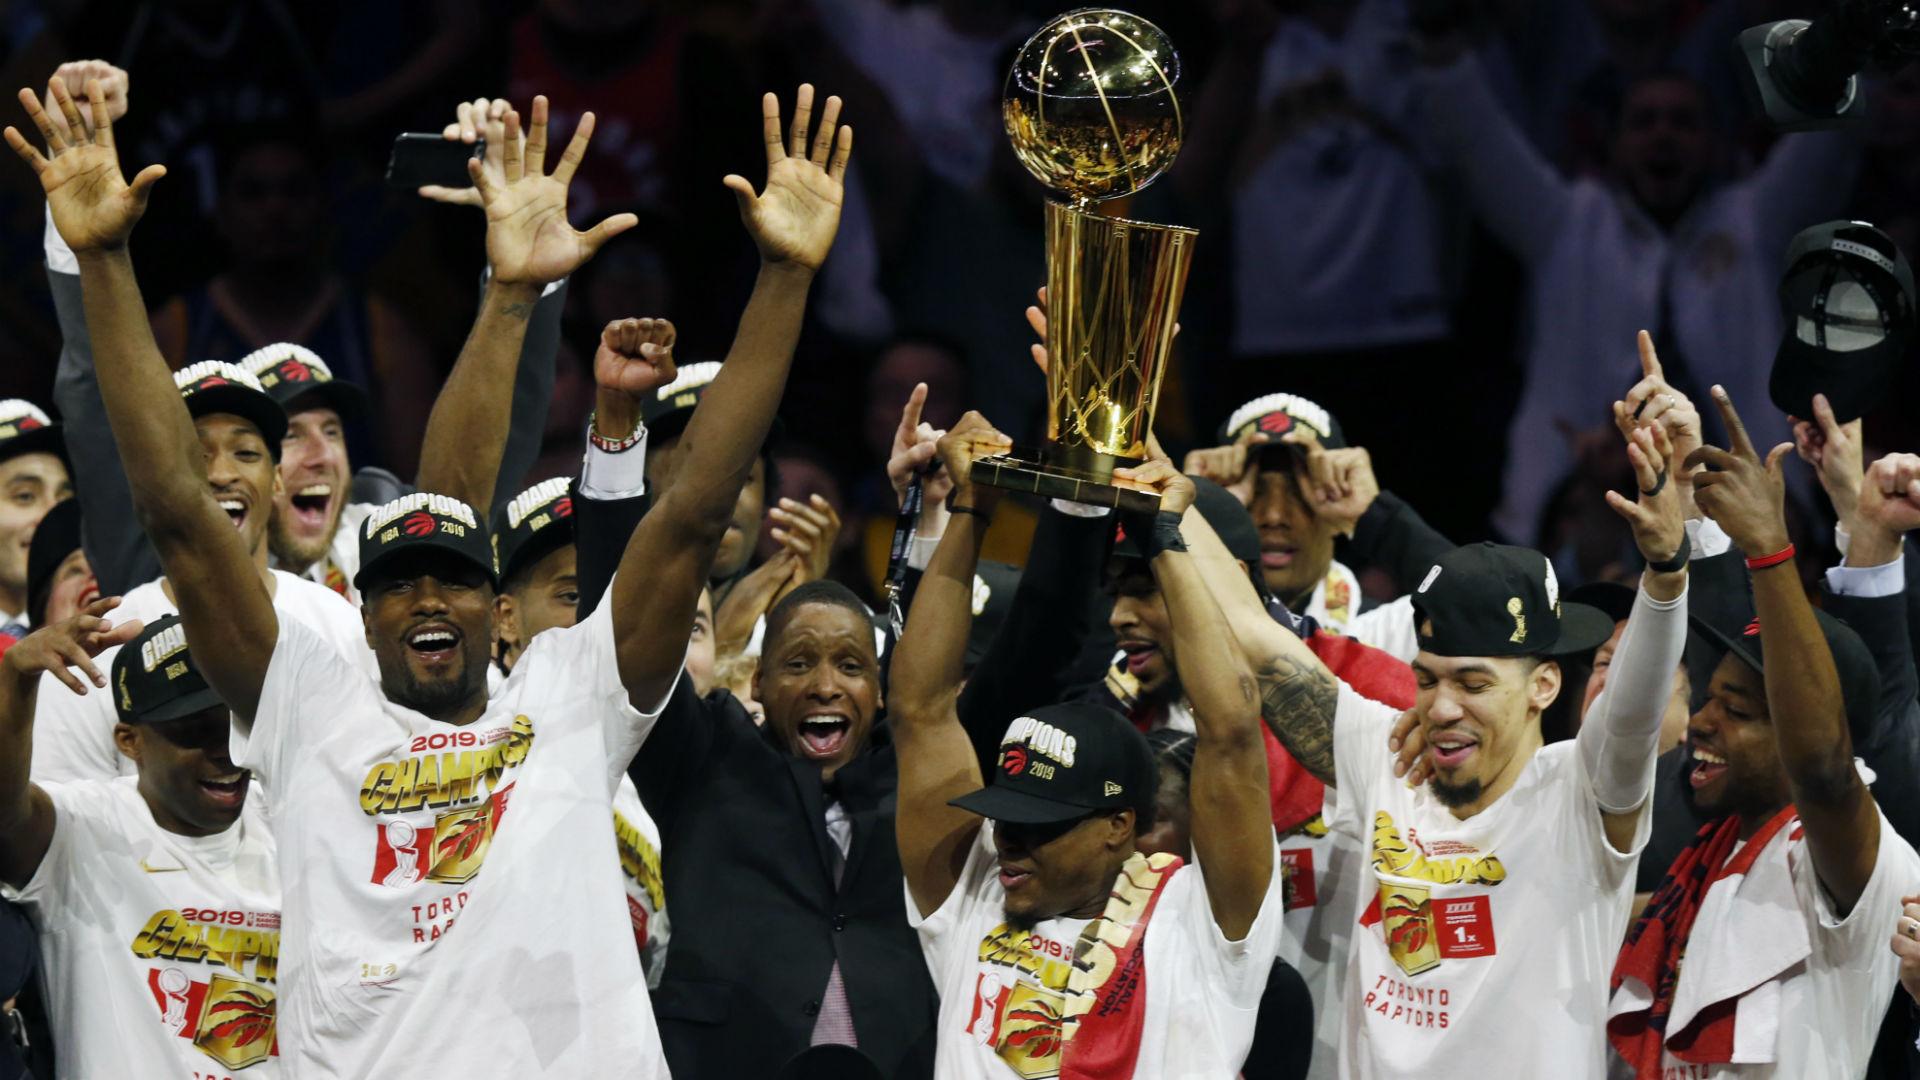 Toronto Raptors: Key moments